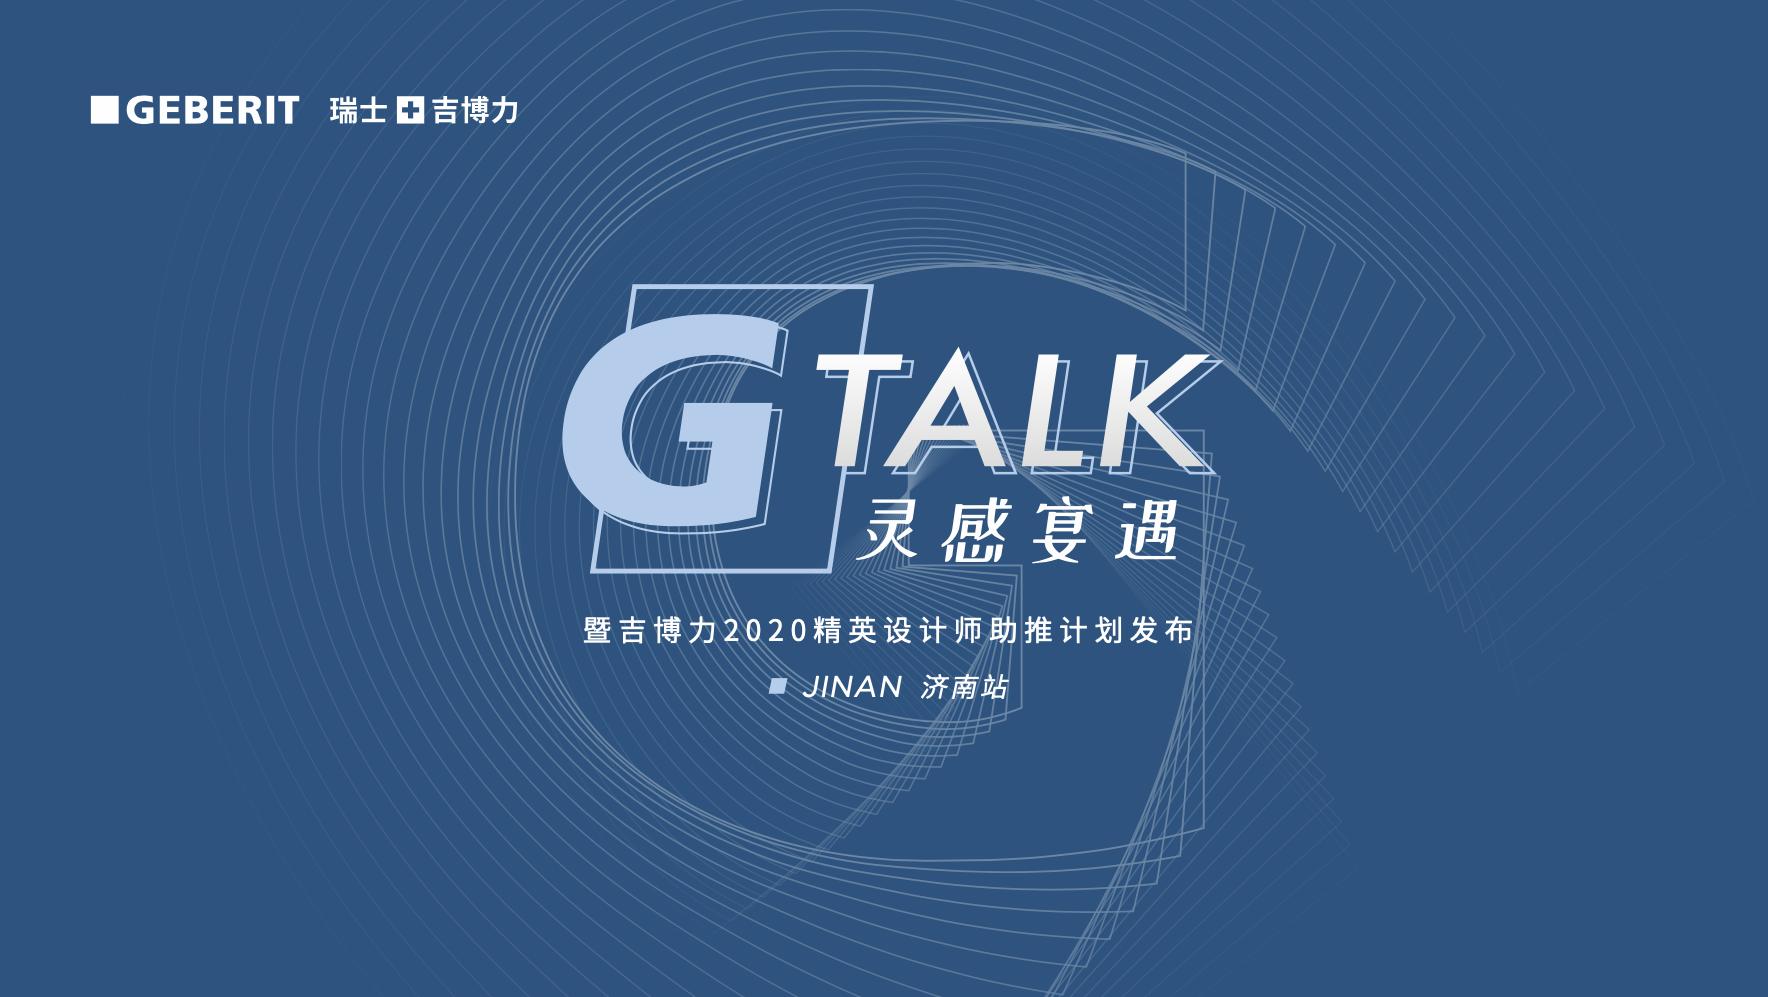 Geberit瑞士吉博力「G-TALK灵感宴遇」第三站|多维能量,共话泉城